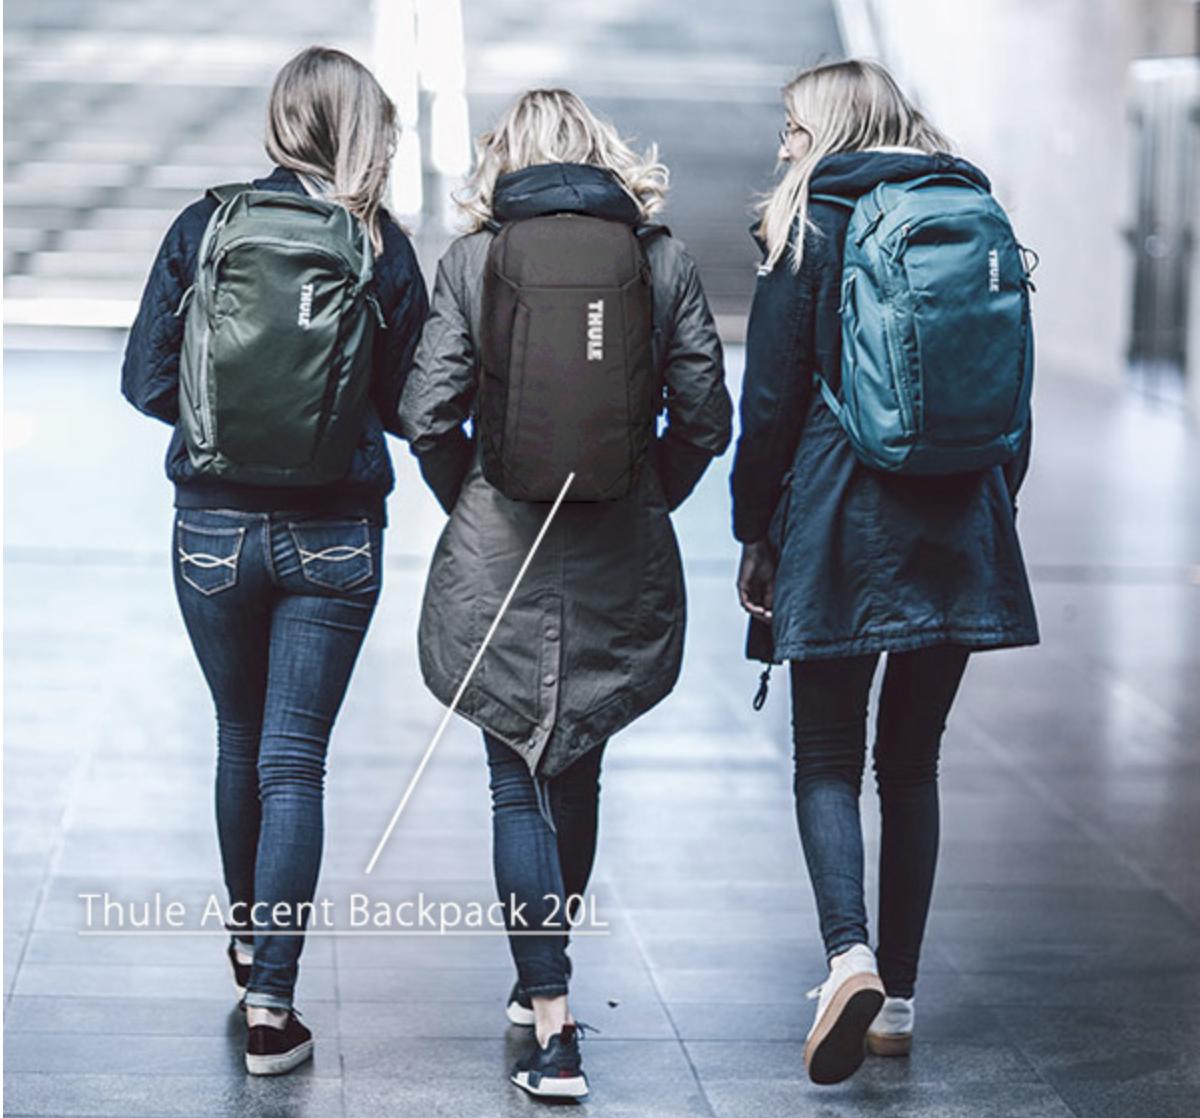 f:id:thebackpack:20190830192636p:plain